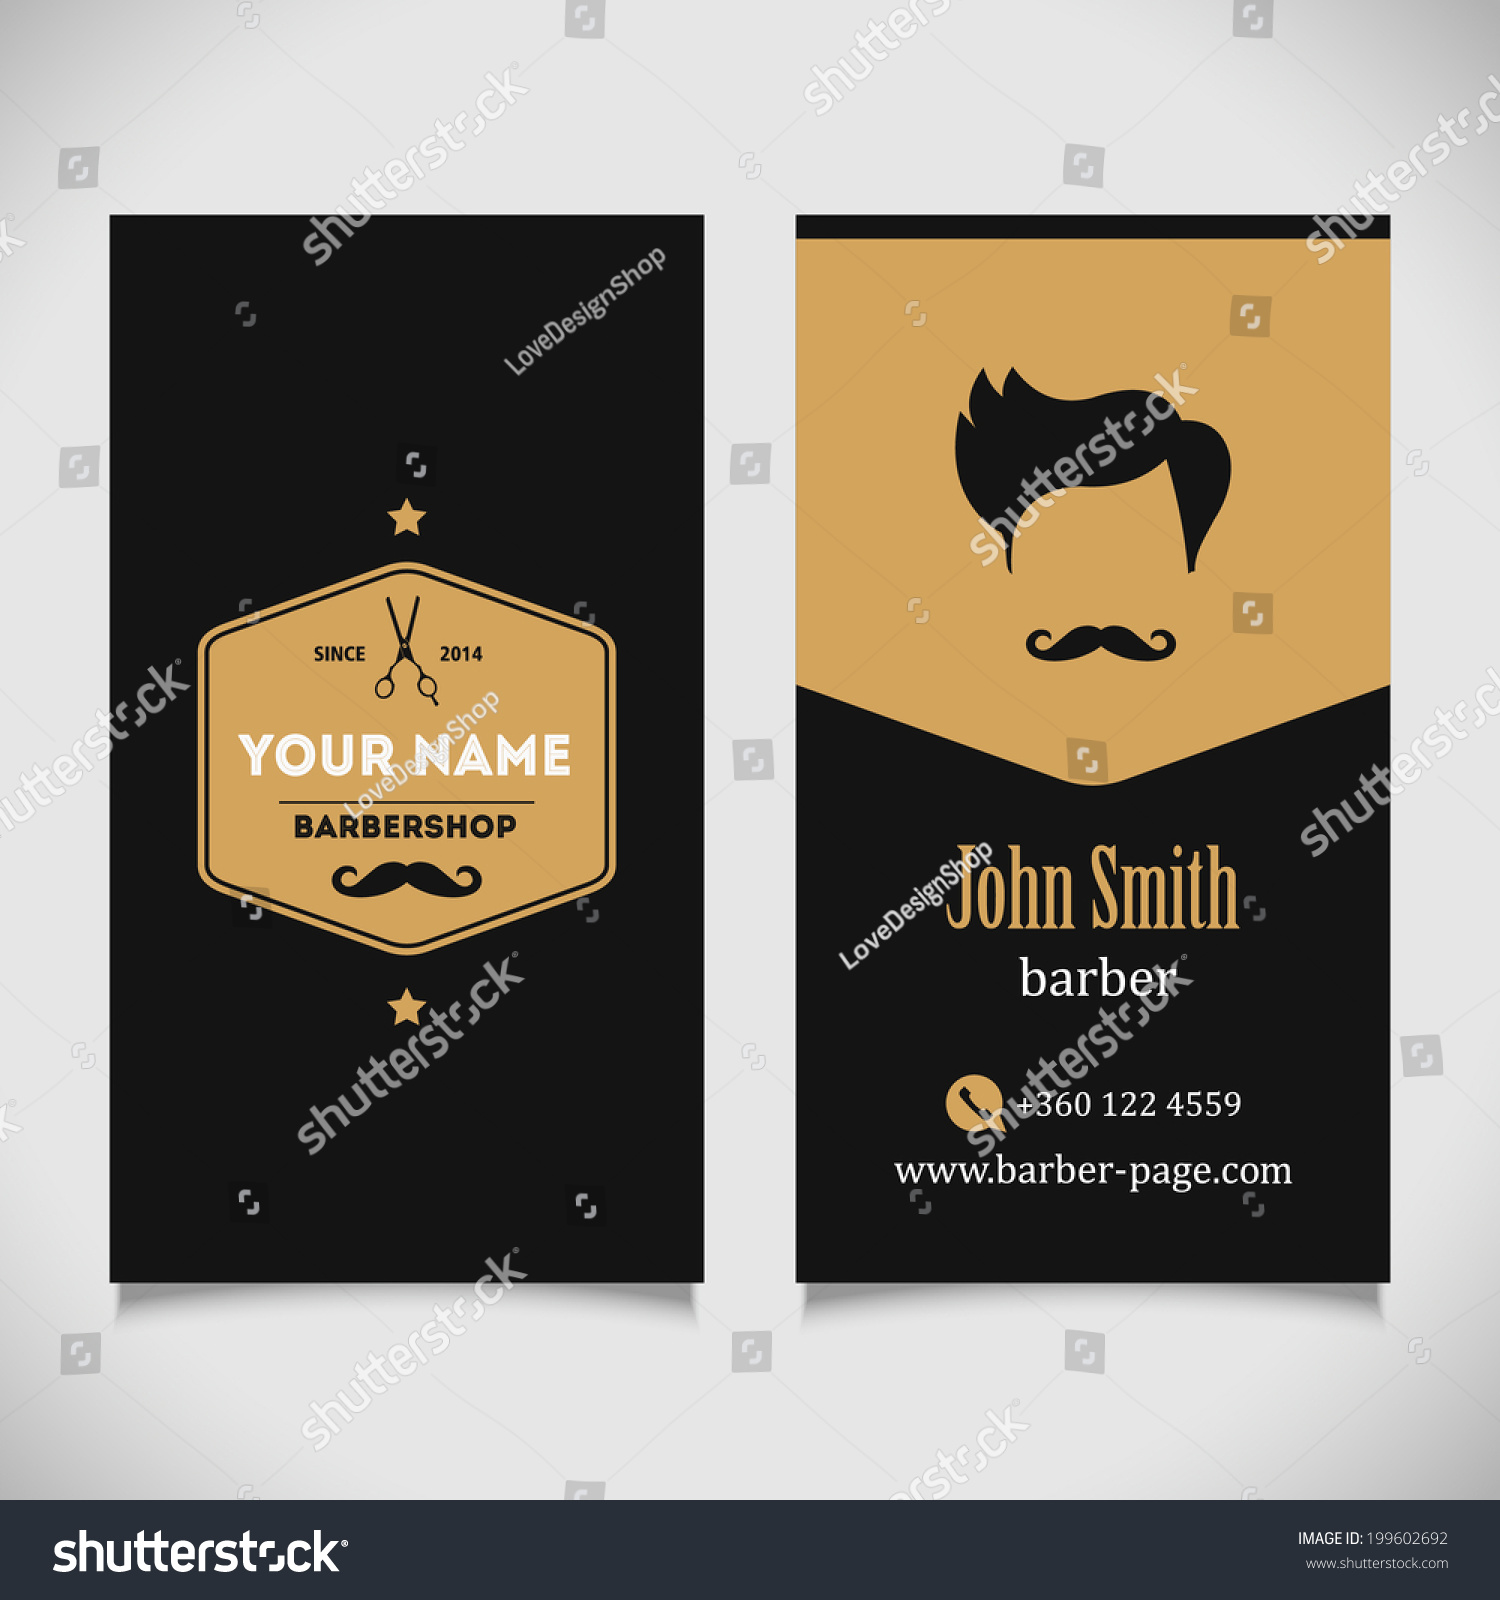 Hair Salon Barber Shop Business Card Stock Vector 199602692 ...